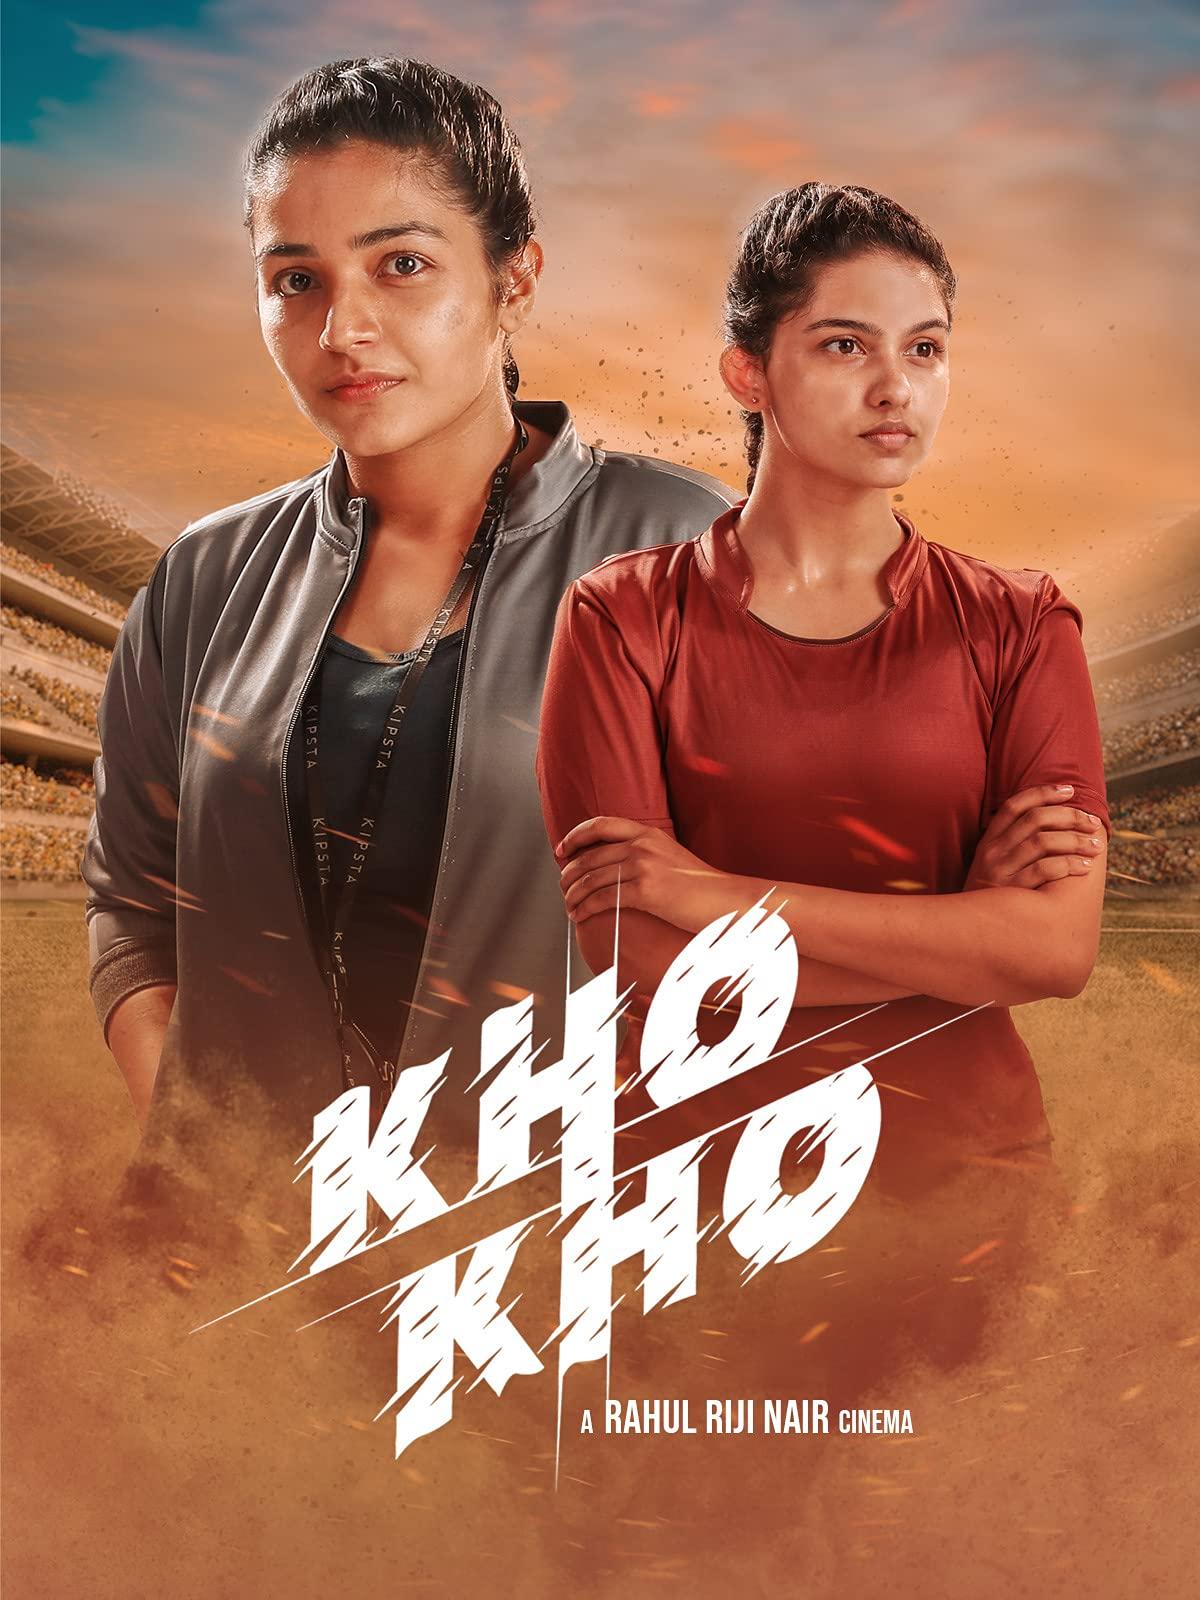 Rajisha Vijayan's Kho Kho Malayalam Movie Review In Tamil By Era. Ramanan. Book Day is Branch of Bharathi Puthakalayam